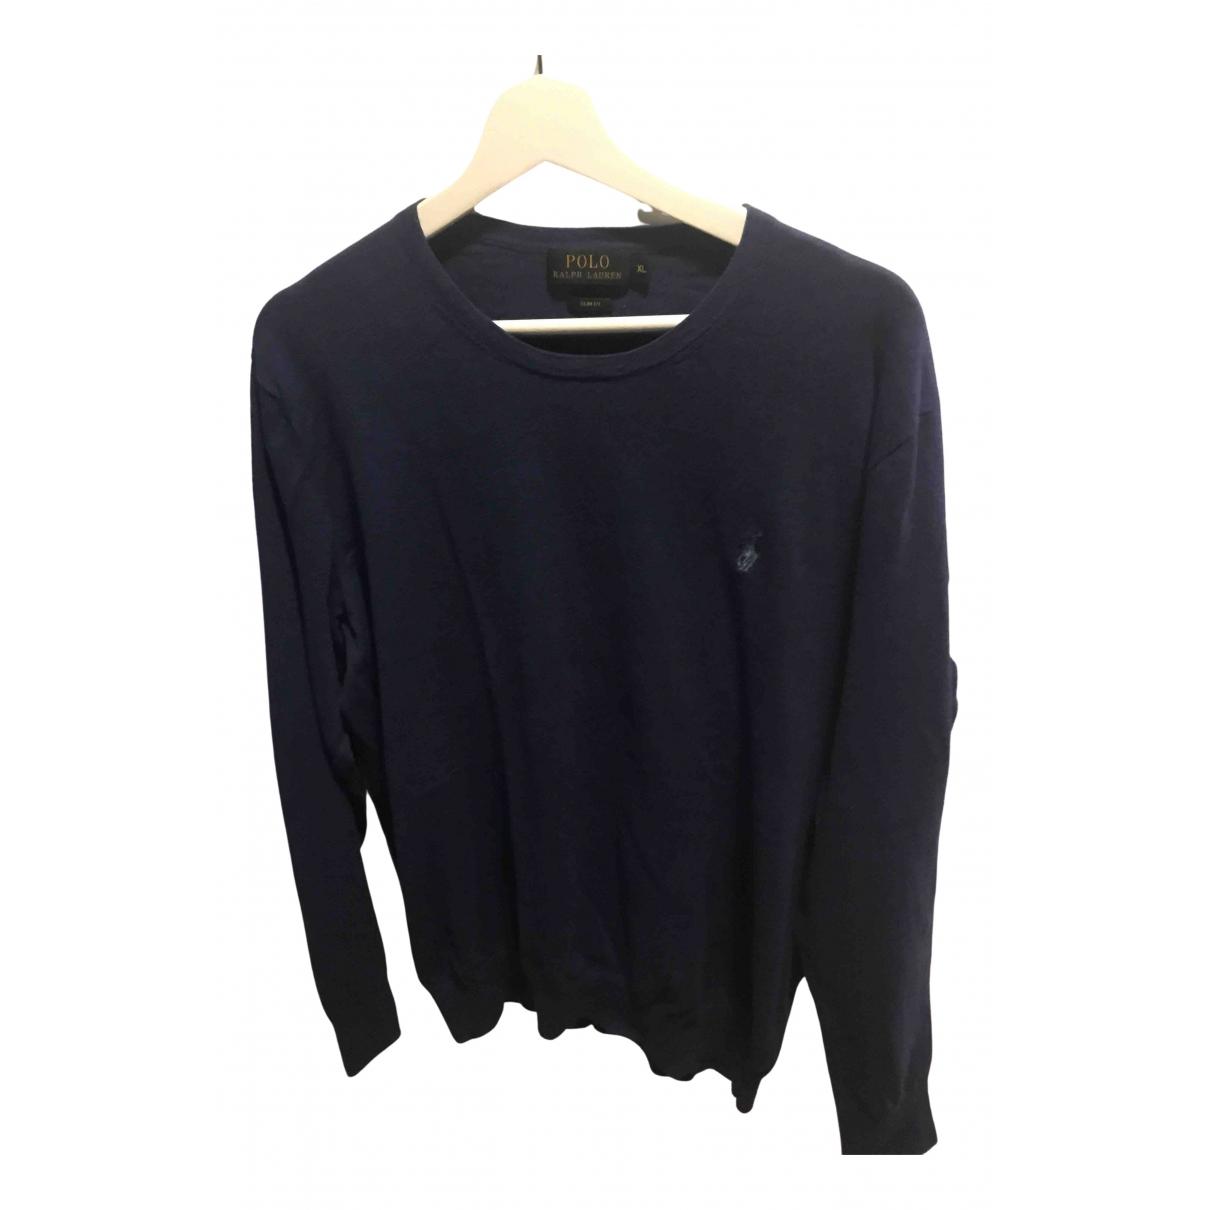 Polo Ralph Lauren N Blue Cotton Knitwear & Sweatshirts for Men XL International